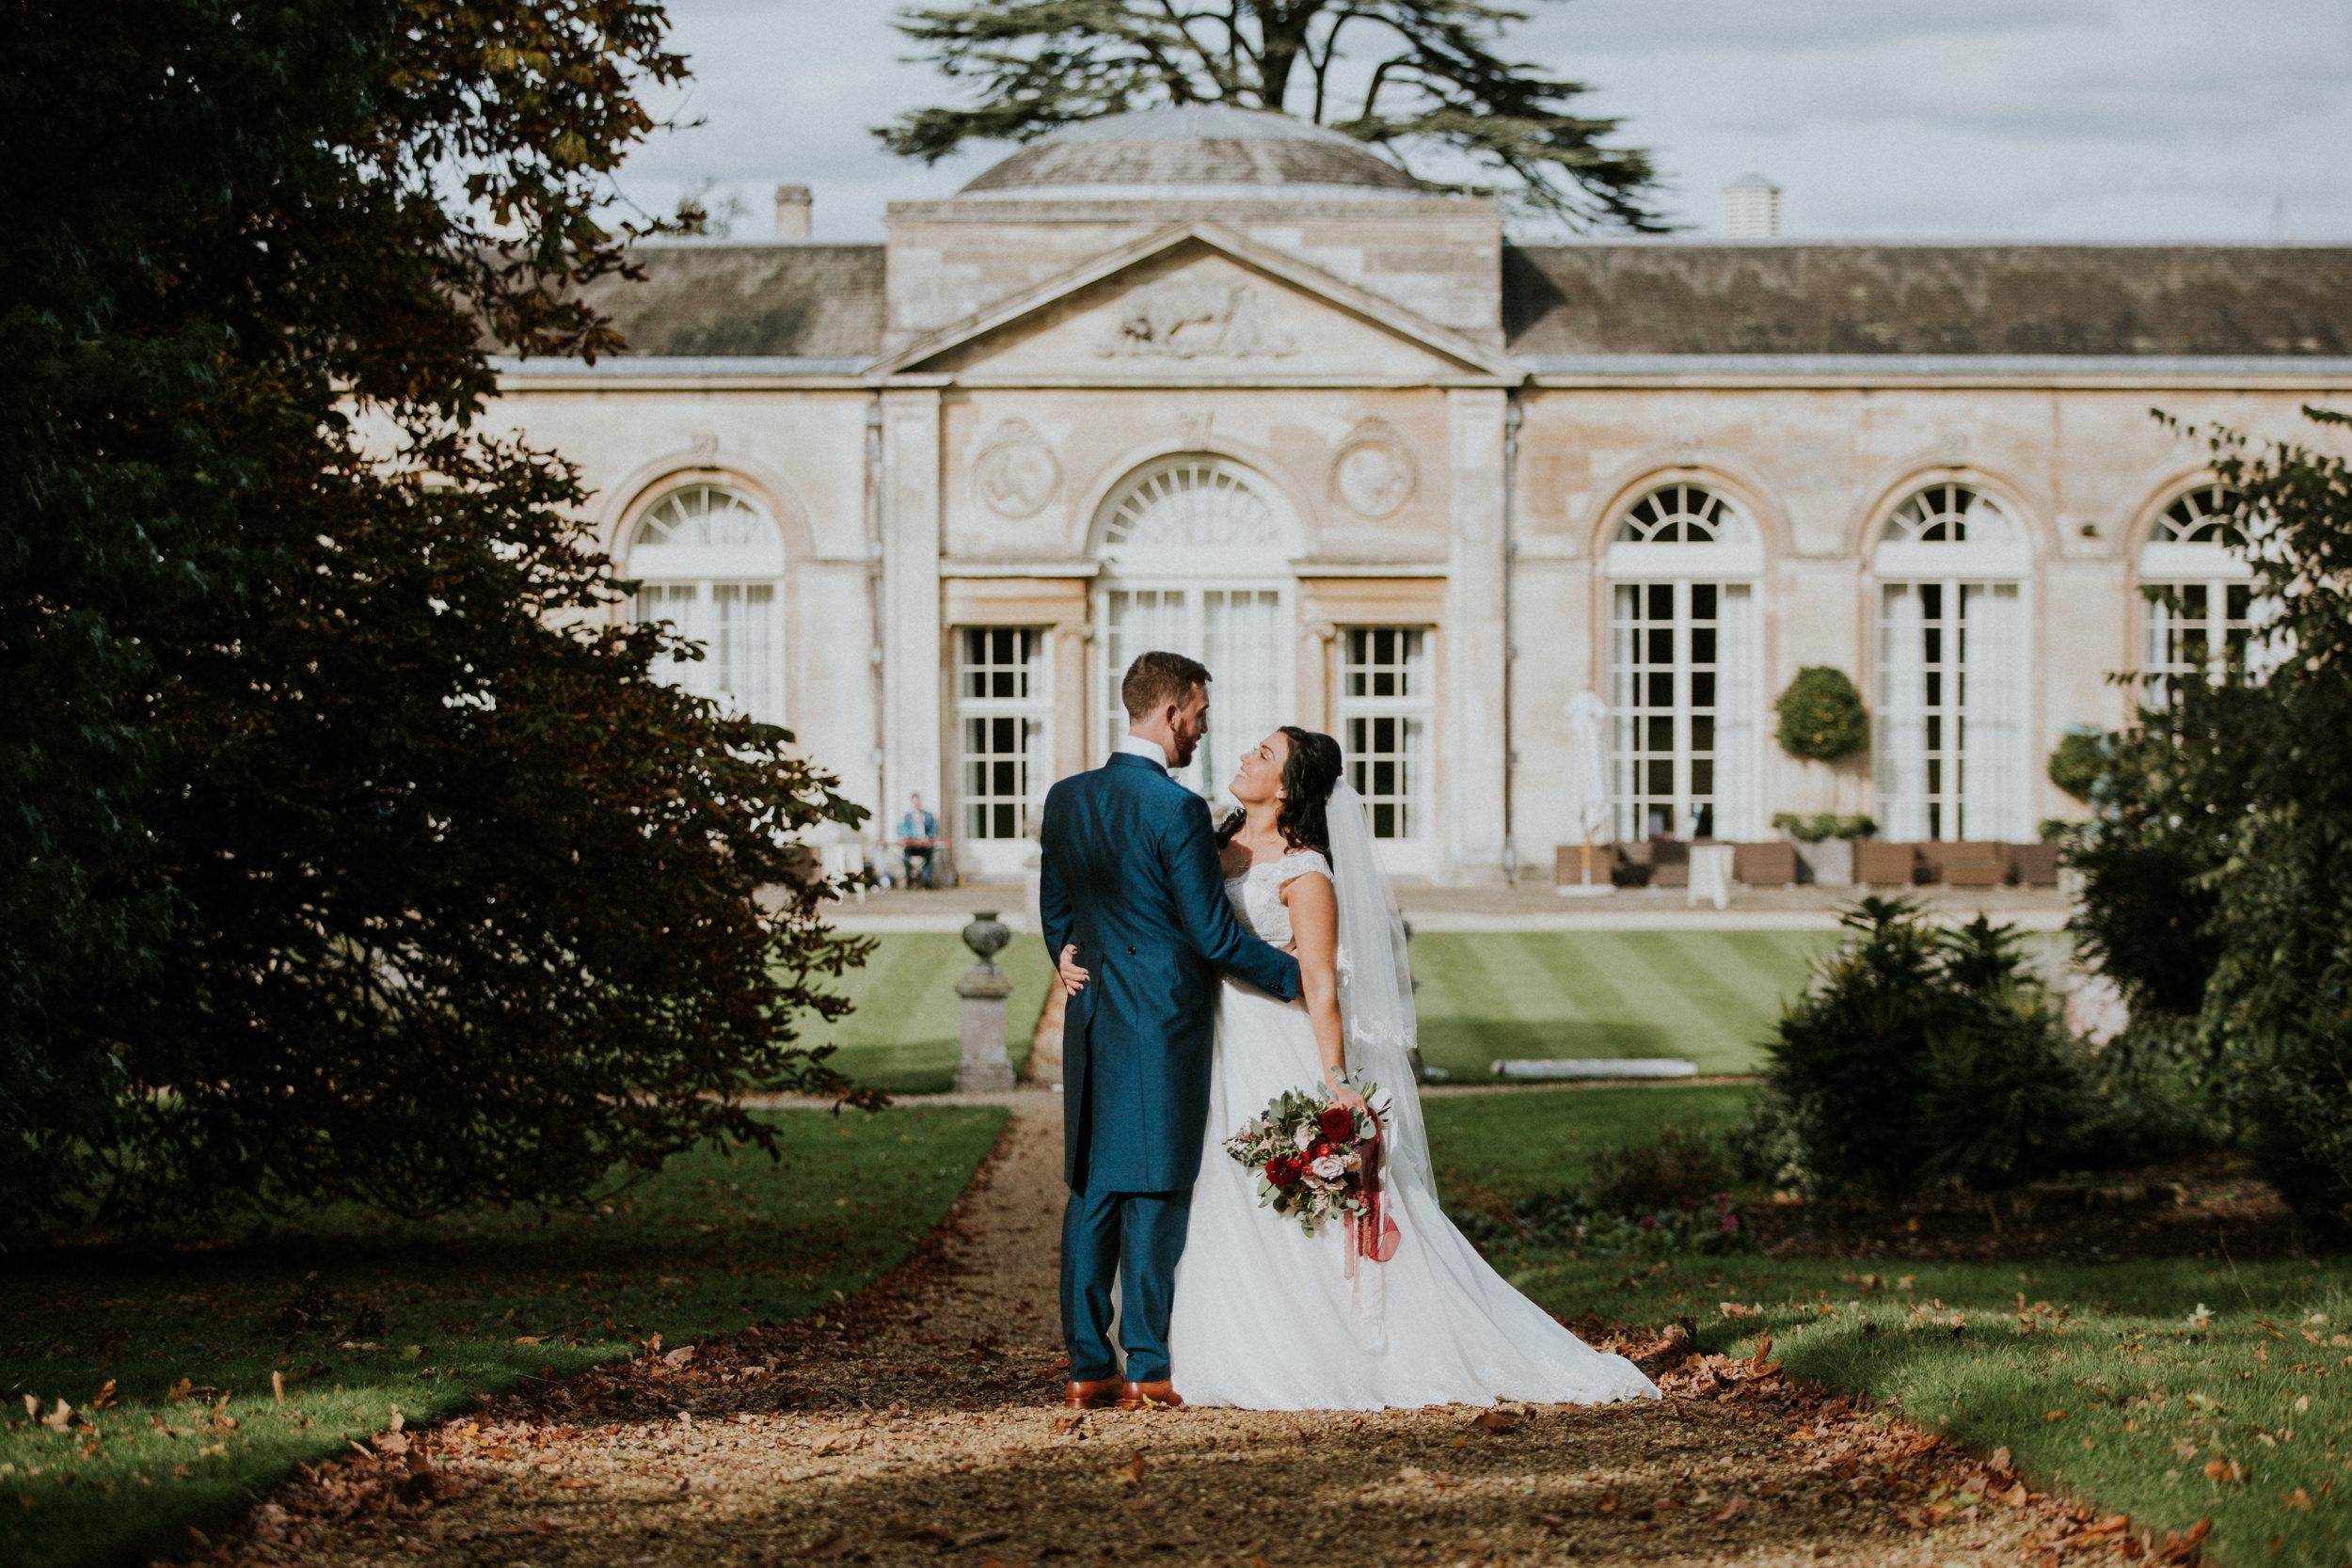 london-bedfordshire-uk-wedding-photography-woburn-sculpture-gallery-bridal-portrait-50